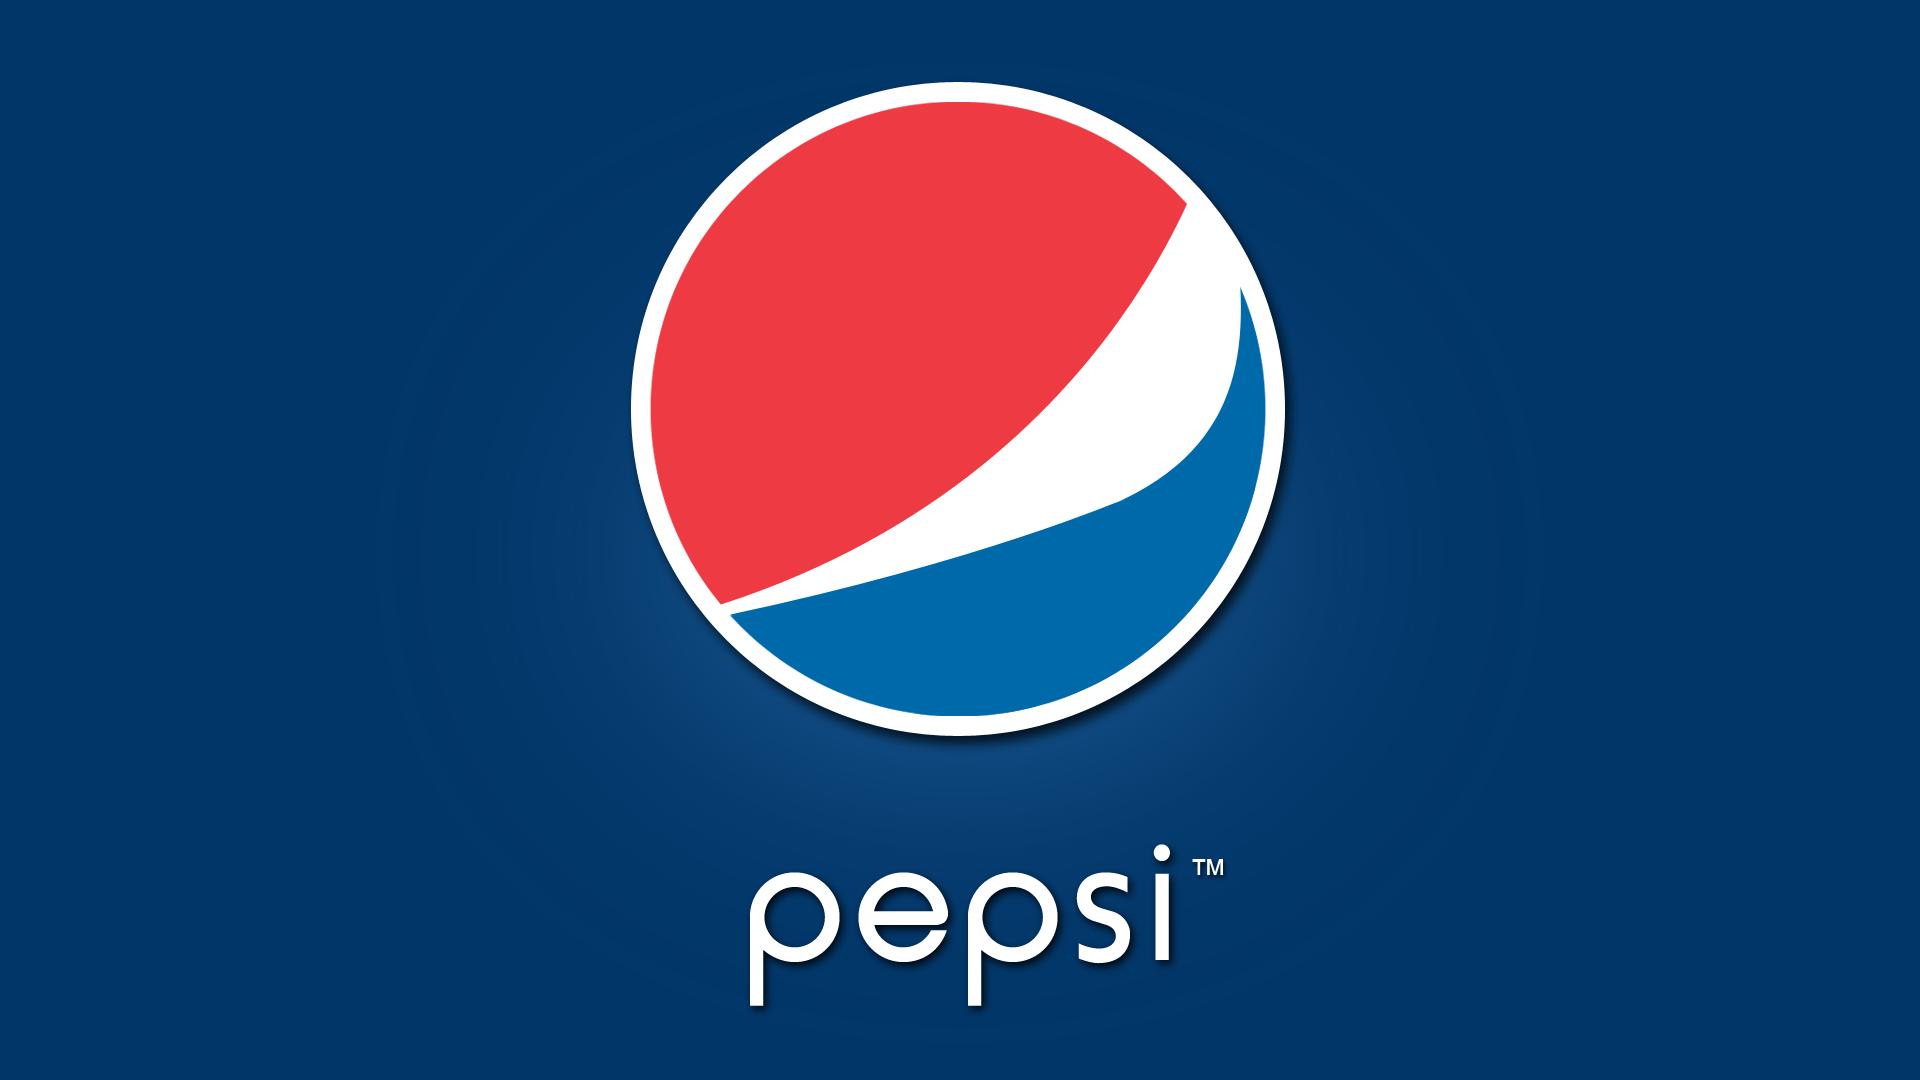 Pepsi Cola Wallpapers 1920x1080